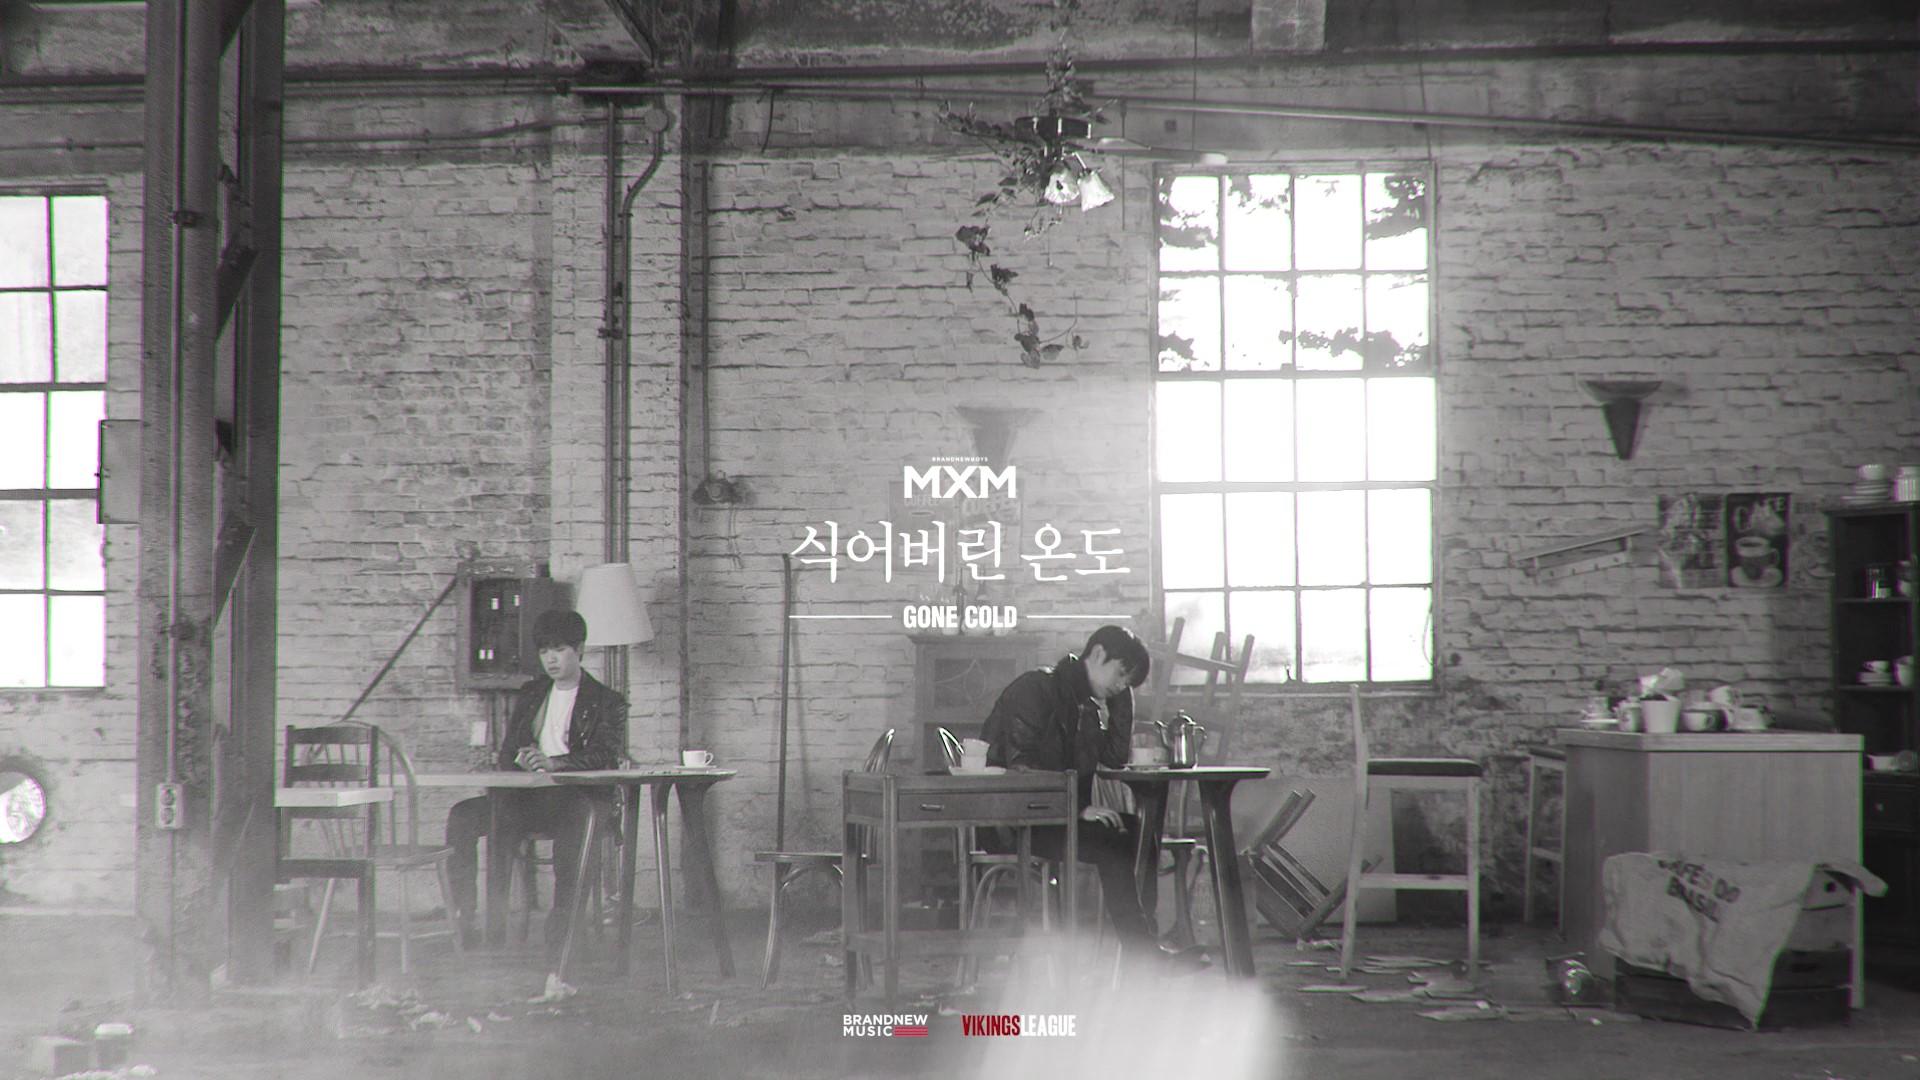 MXM (BRANDNEWBOYS) – '식어버린 온도 (GONE COLD)' Official M/V